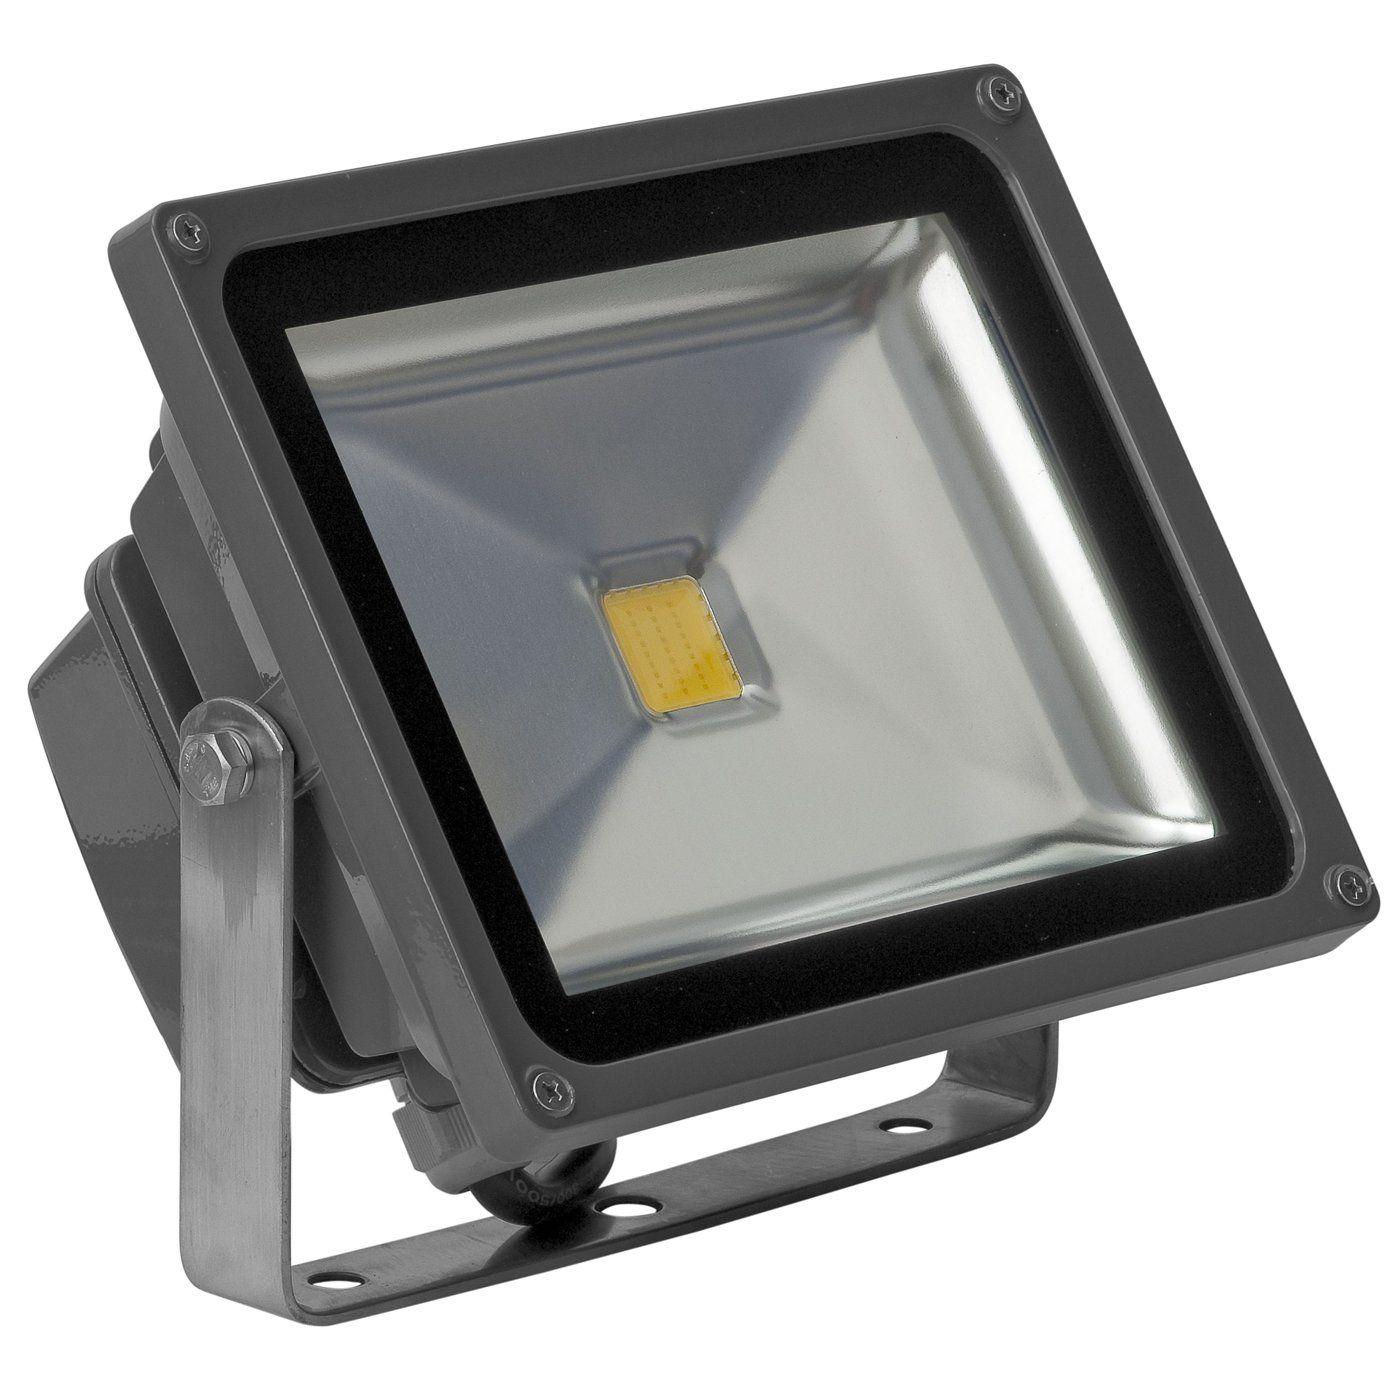 We Have Ultra High Output High Efficiency Led Floodlights Our Technology Ensures Long Led And Driver Lifespan Peb Flood Light Fixtures Flood Lights Led Flood